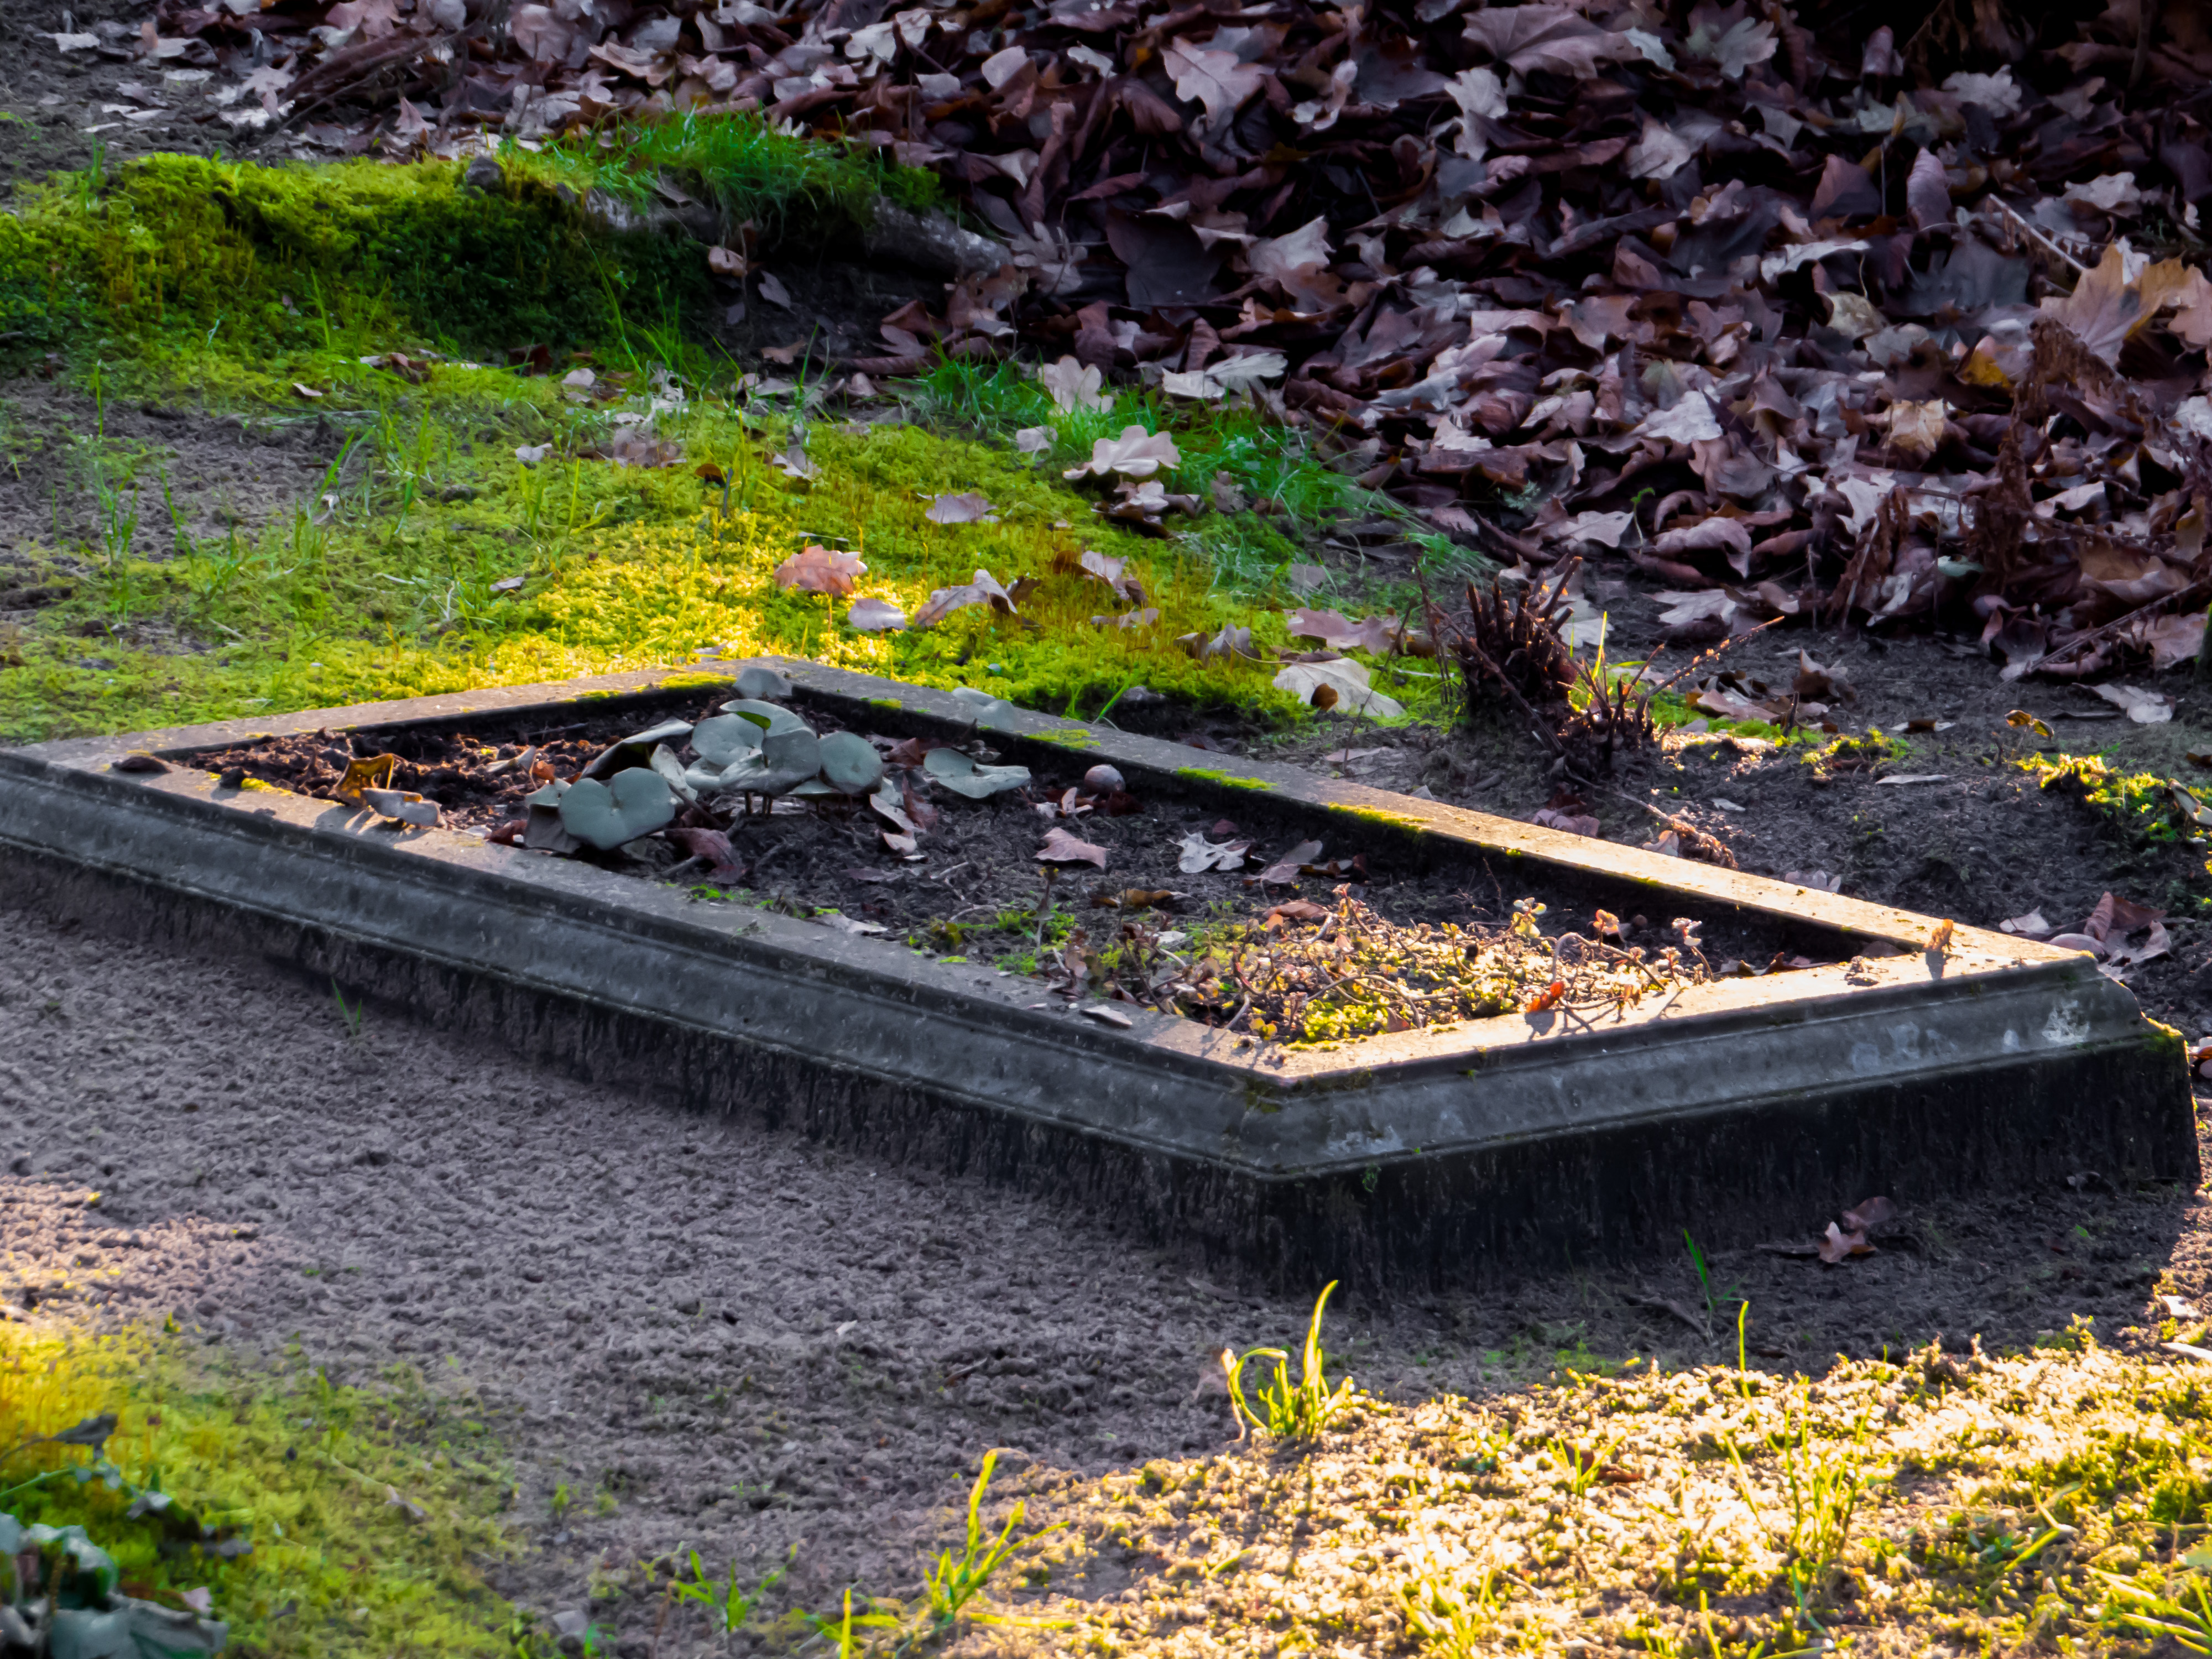 Grave photo